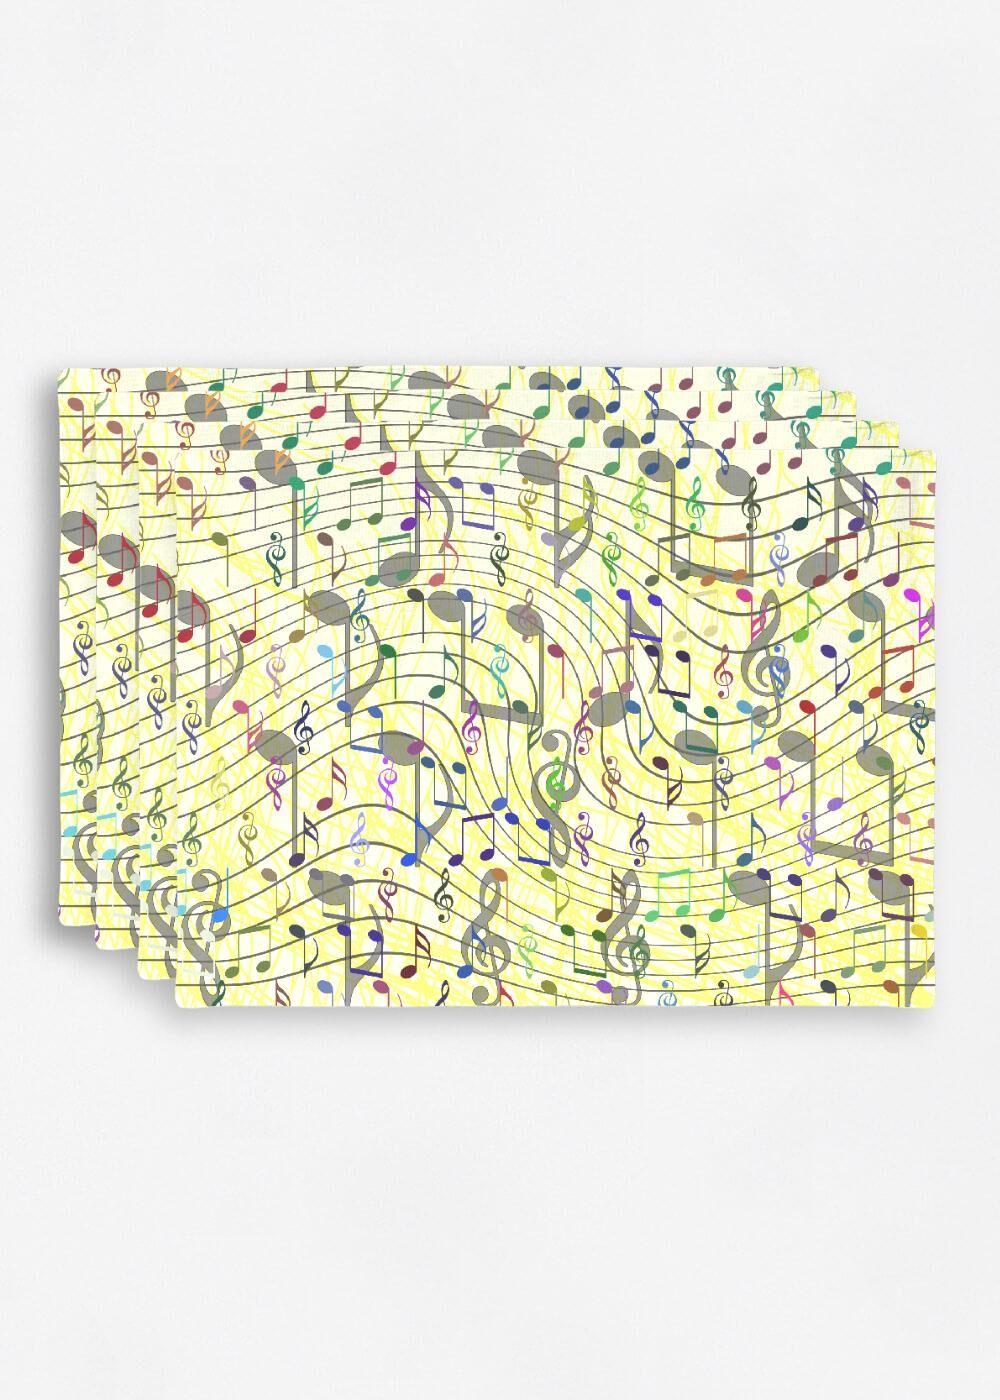 VIDA Placemat Set - Chaotic Music Notation by VIDA Original Artist  - Size: Set of 4